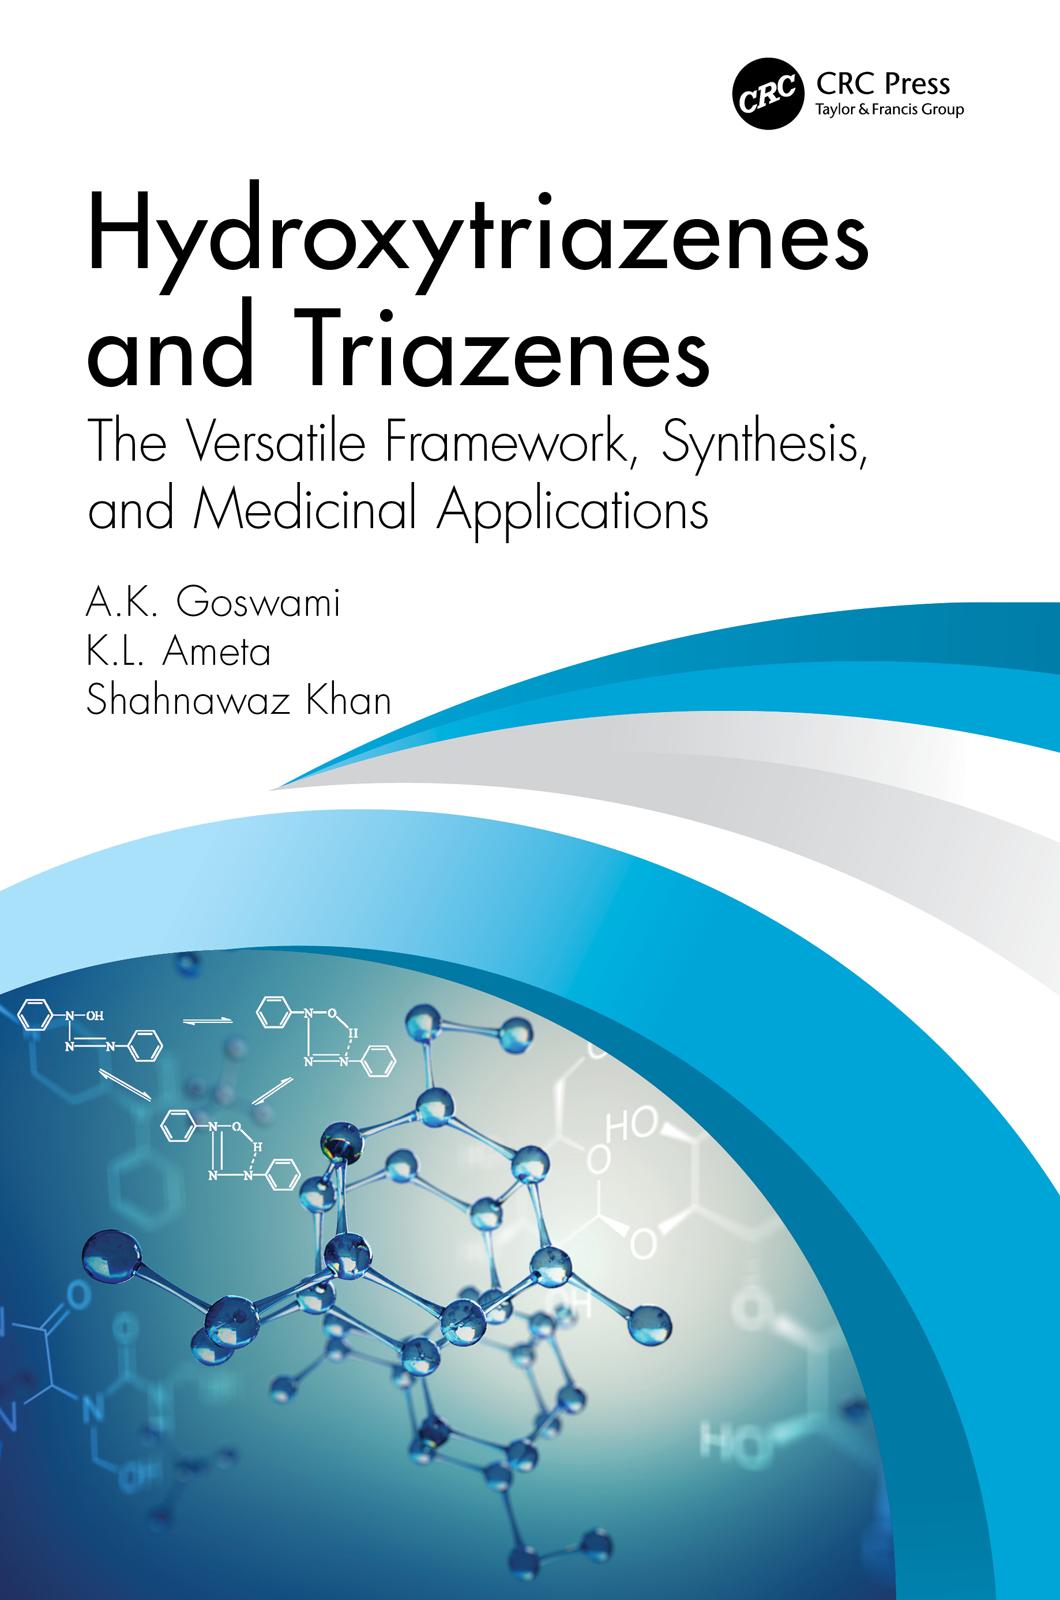 Medicinal applications of hydroxytriazenes